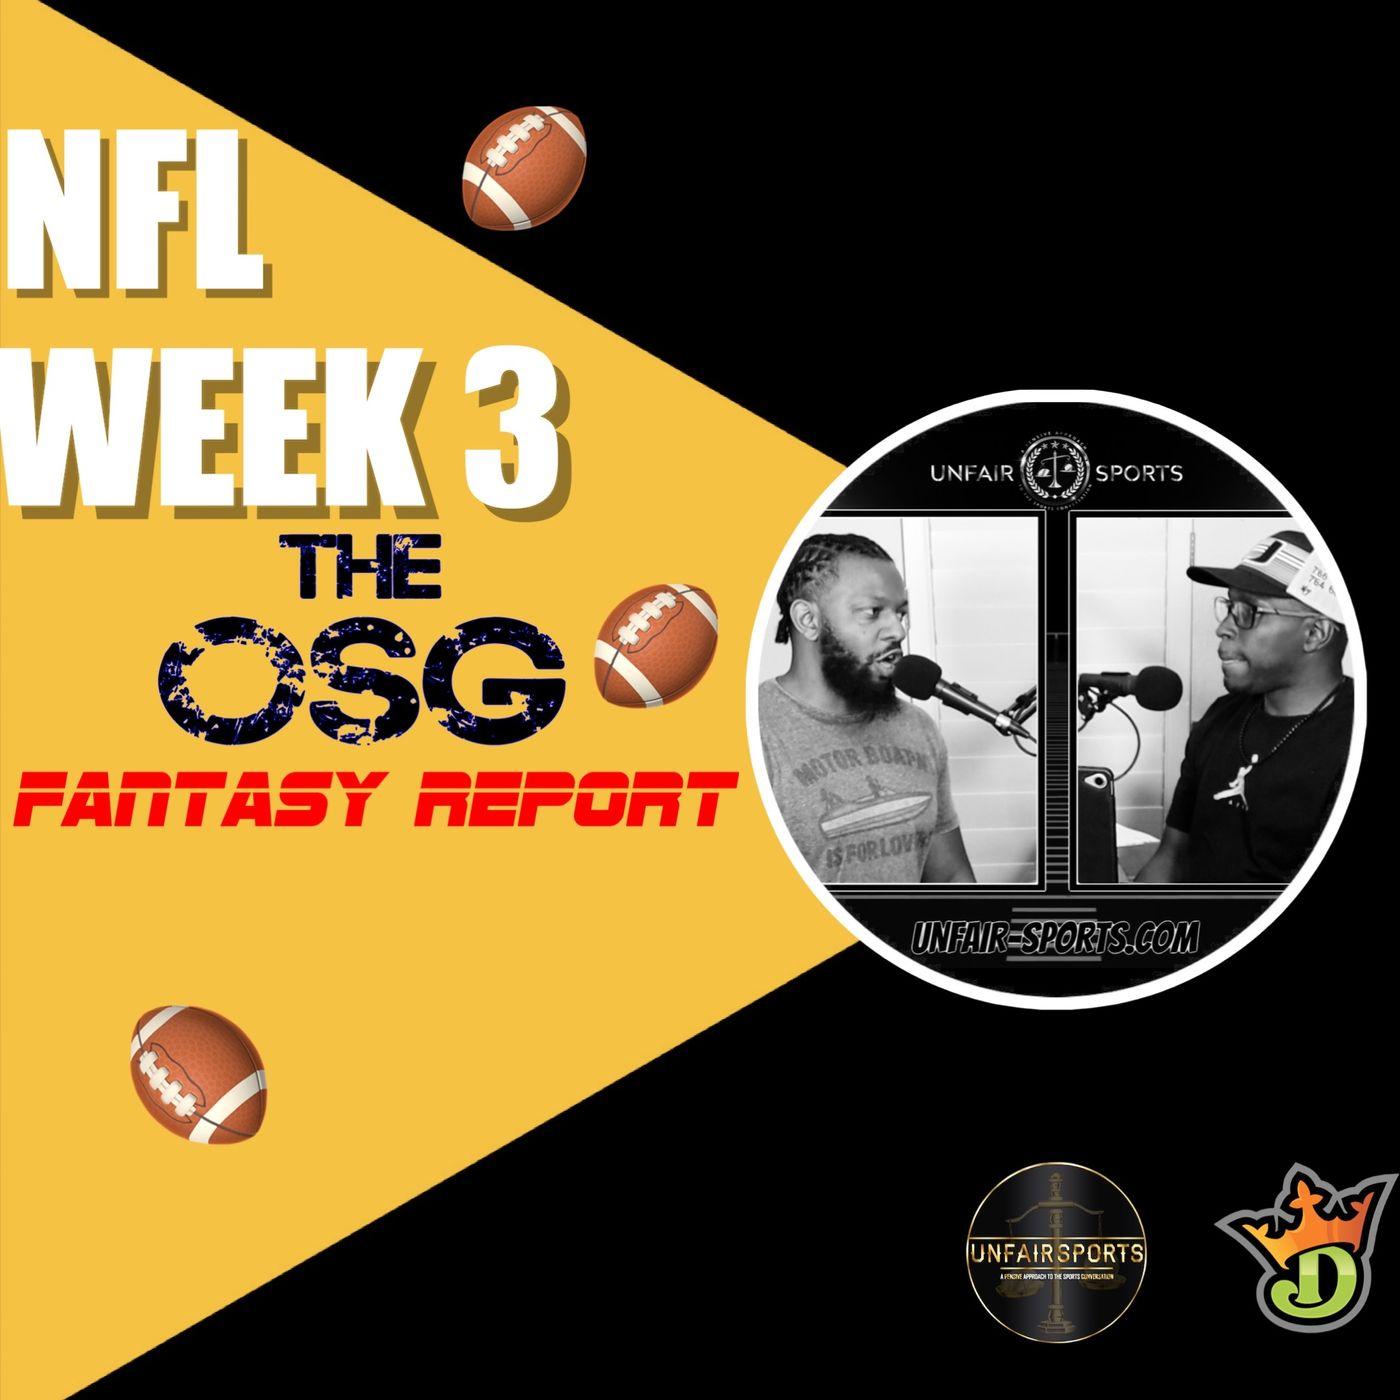 Week 3 OSG Report Daily Fantasy Show